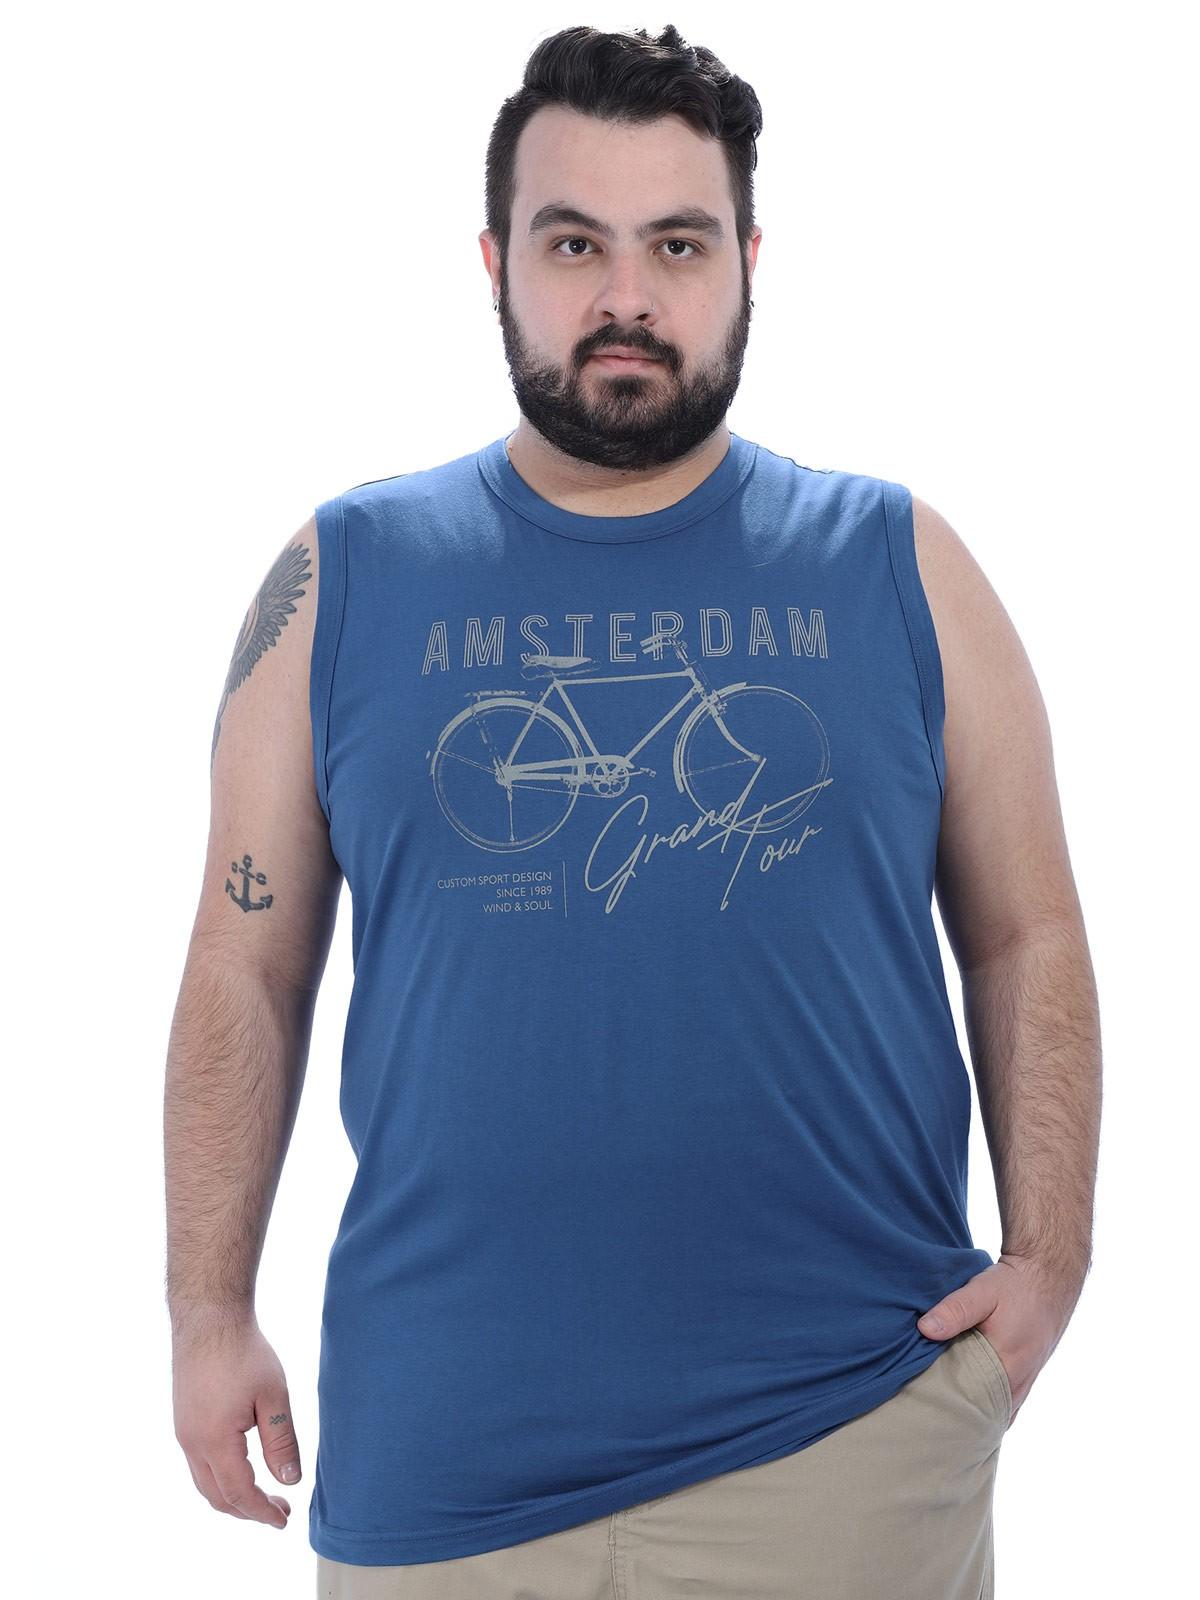 Regata Plus Size Masculina Machão Bicicleta Anistia Azul Jeans